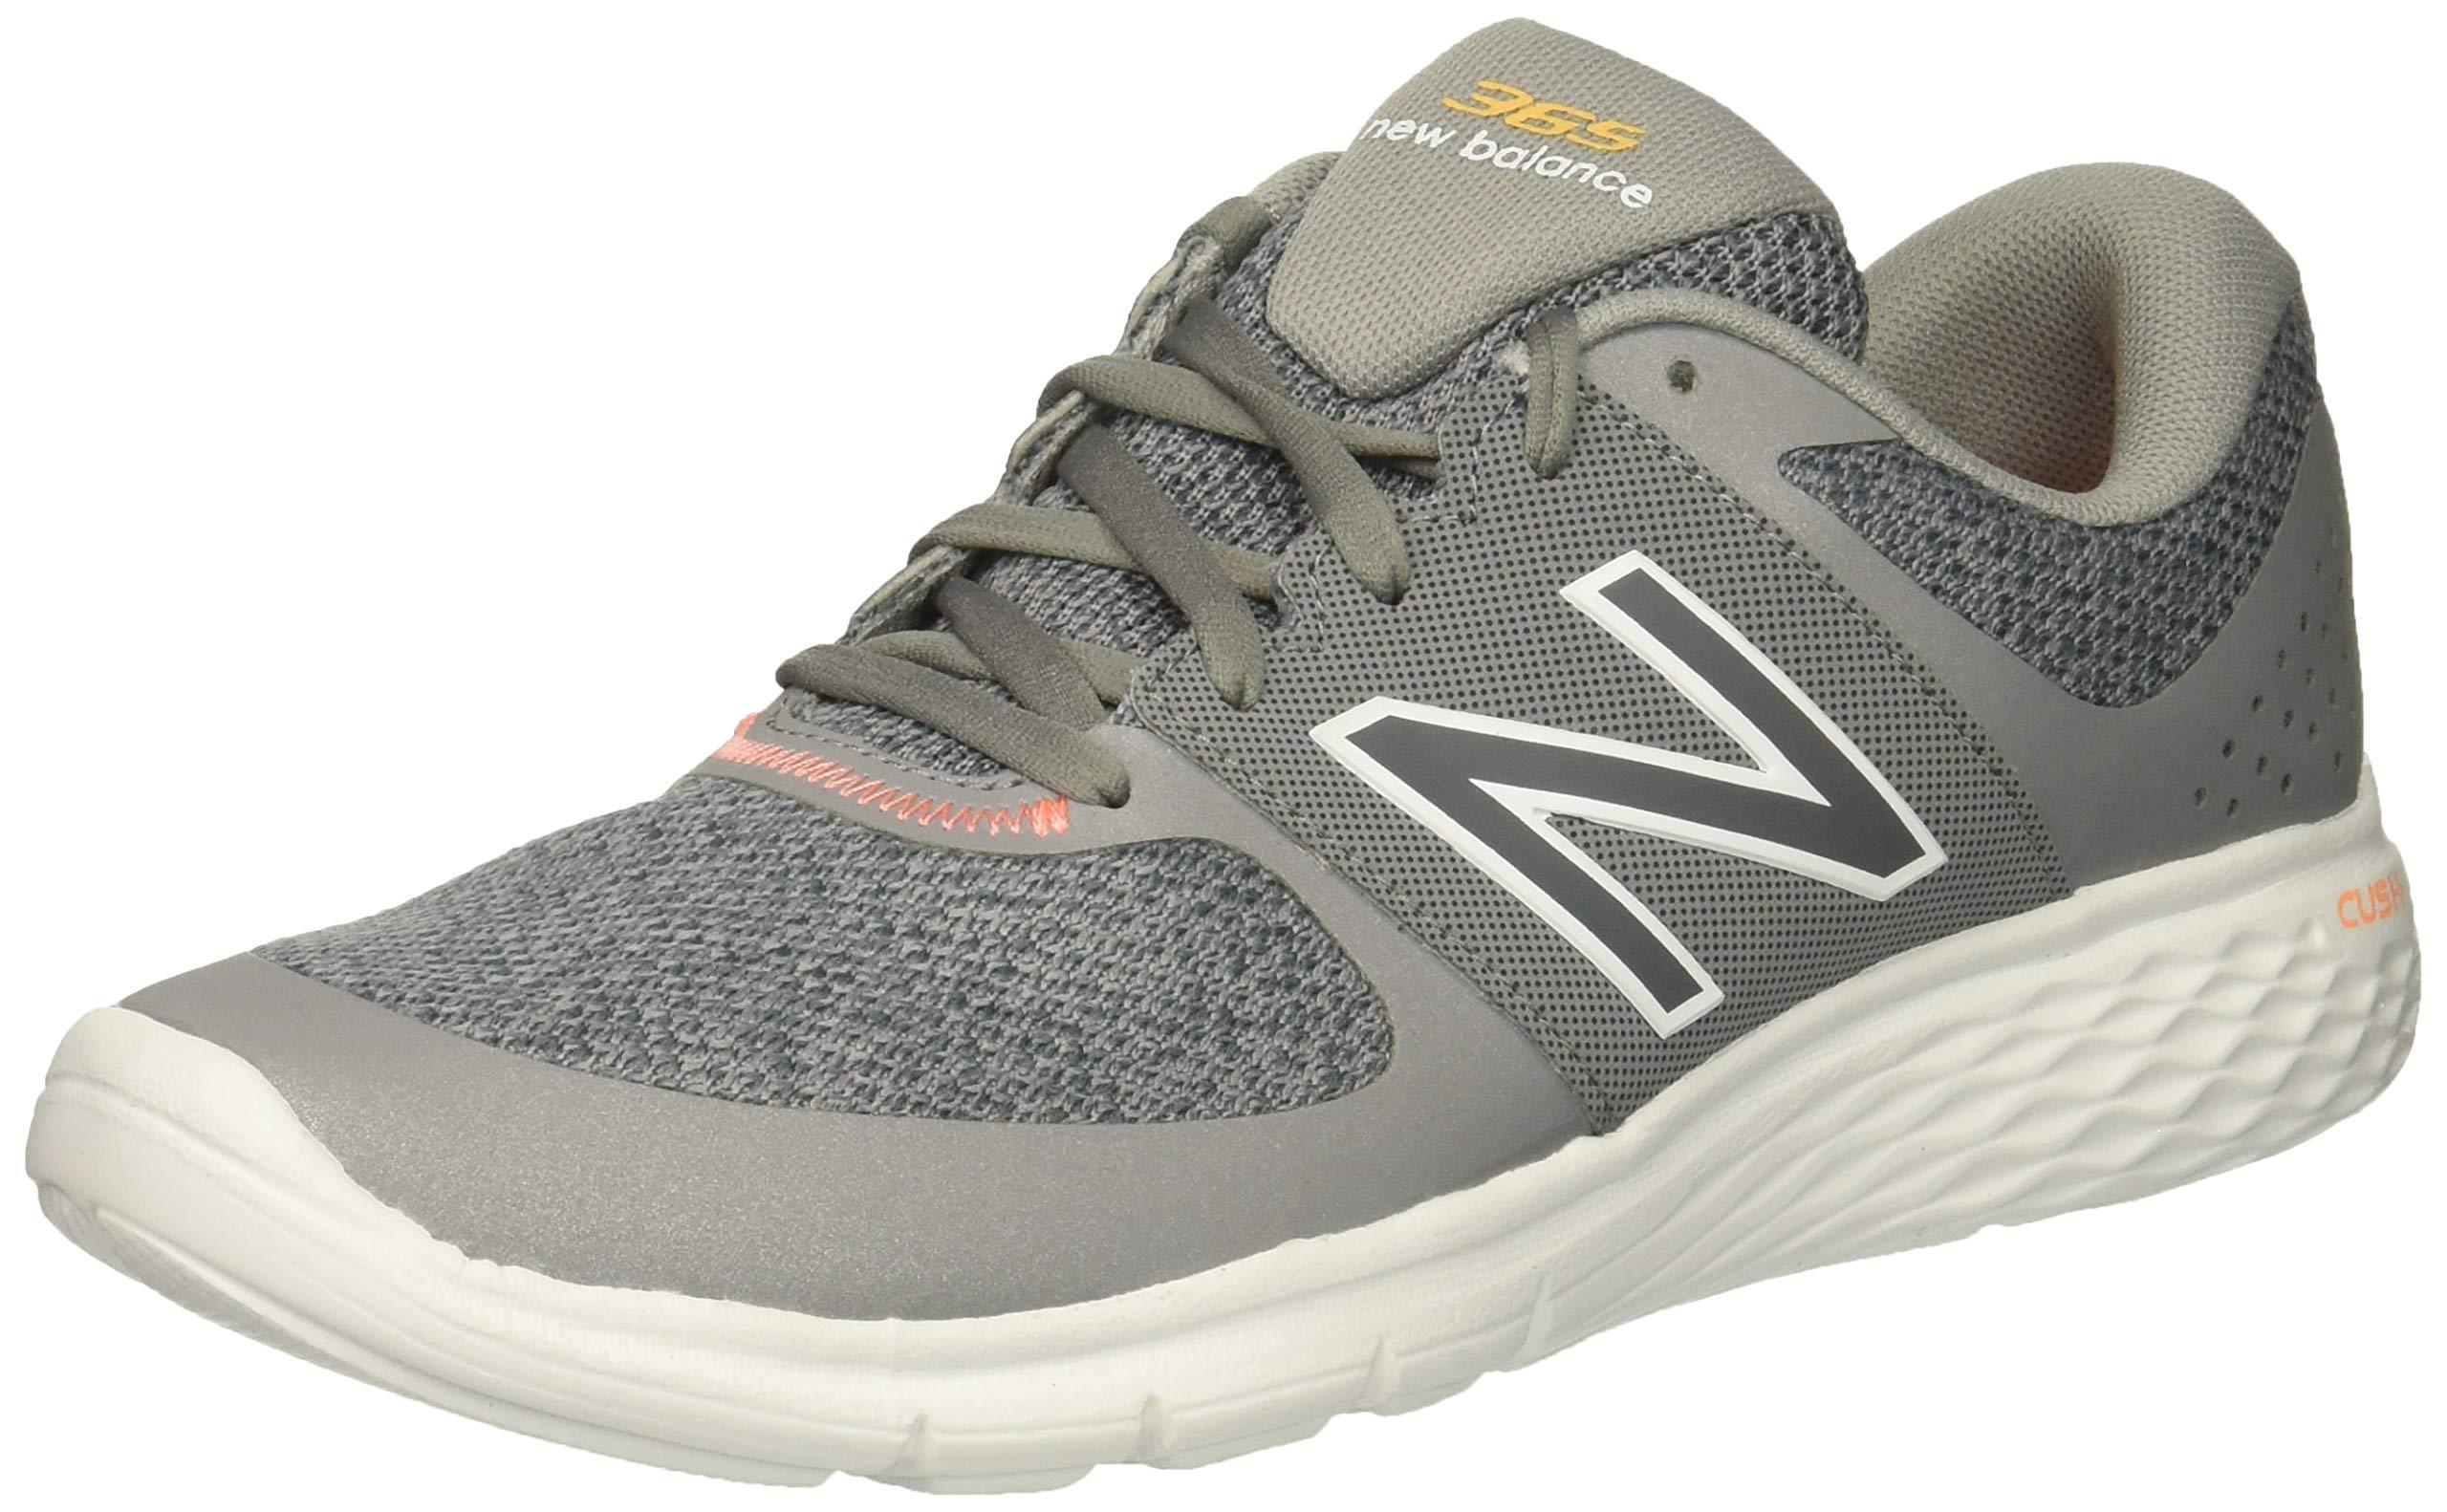 New Balance 365 V1 Walking Shoe in Grey